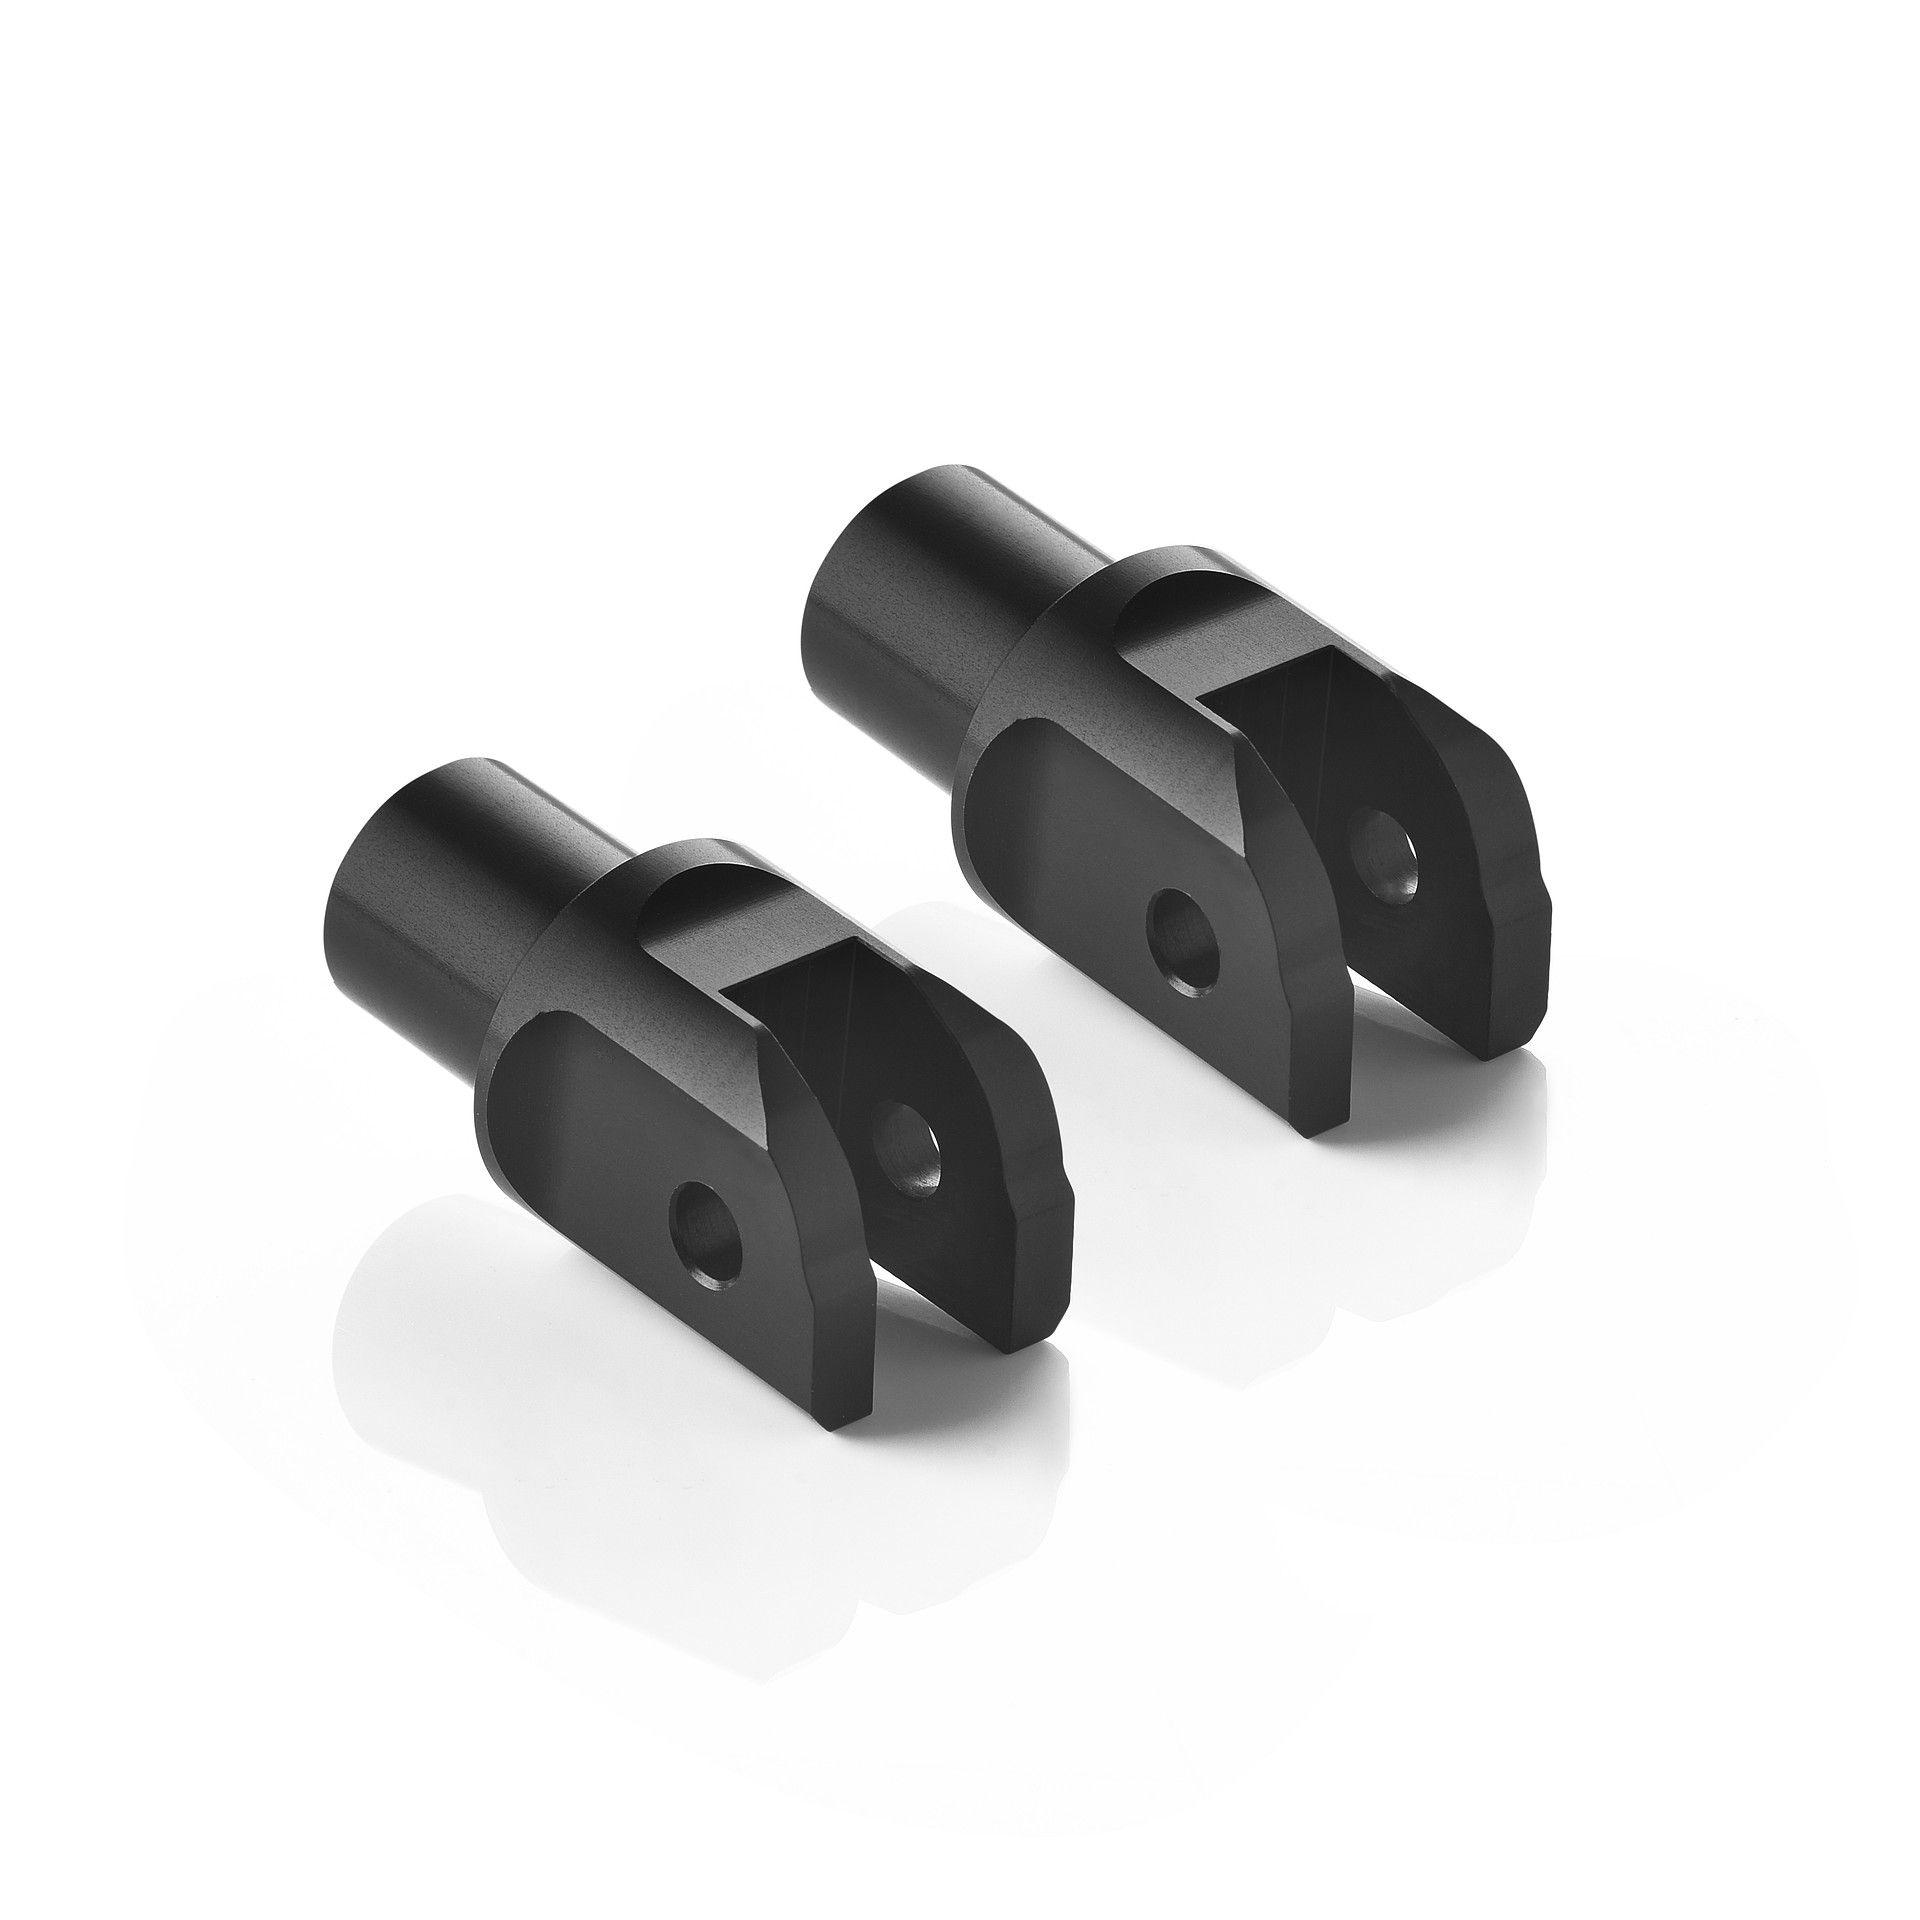 Rizoma peg mounting kit (∅ 18 mm)